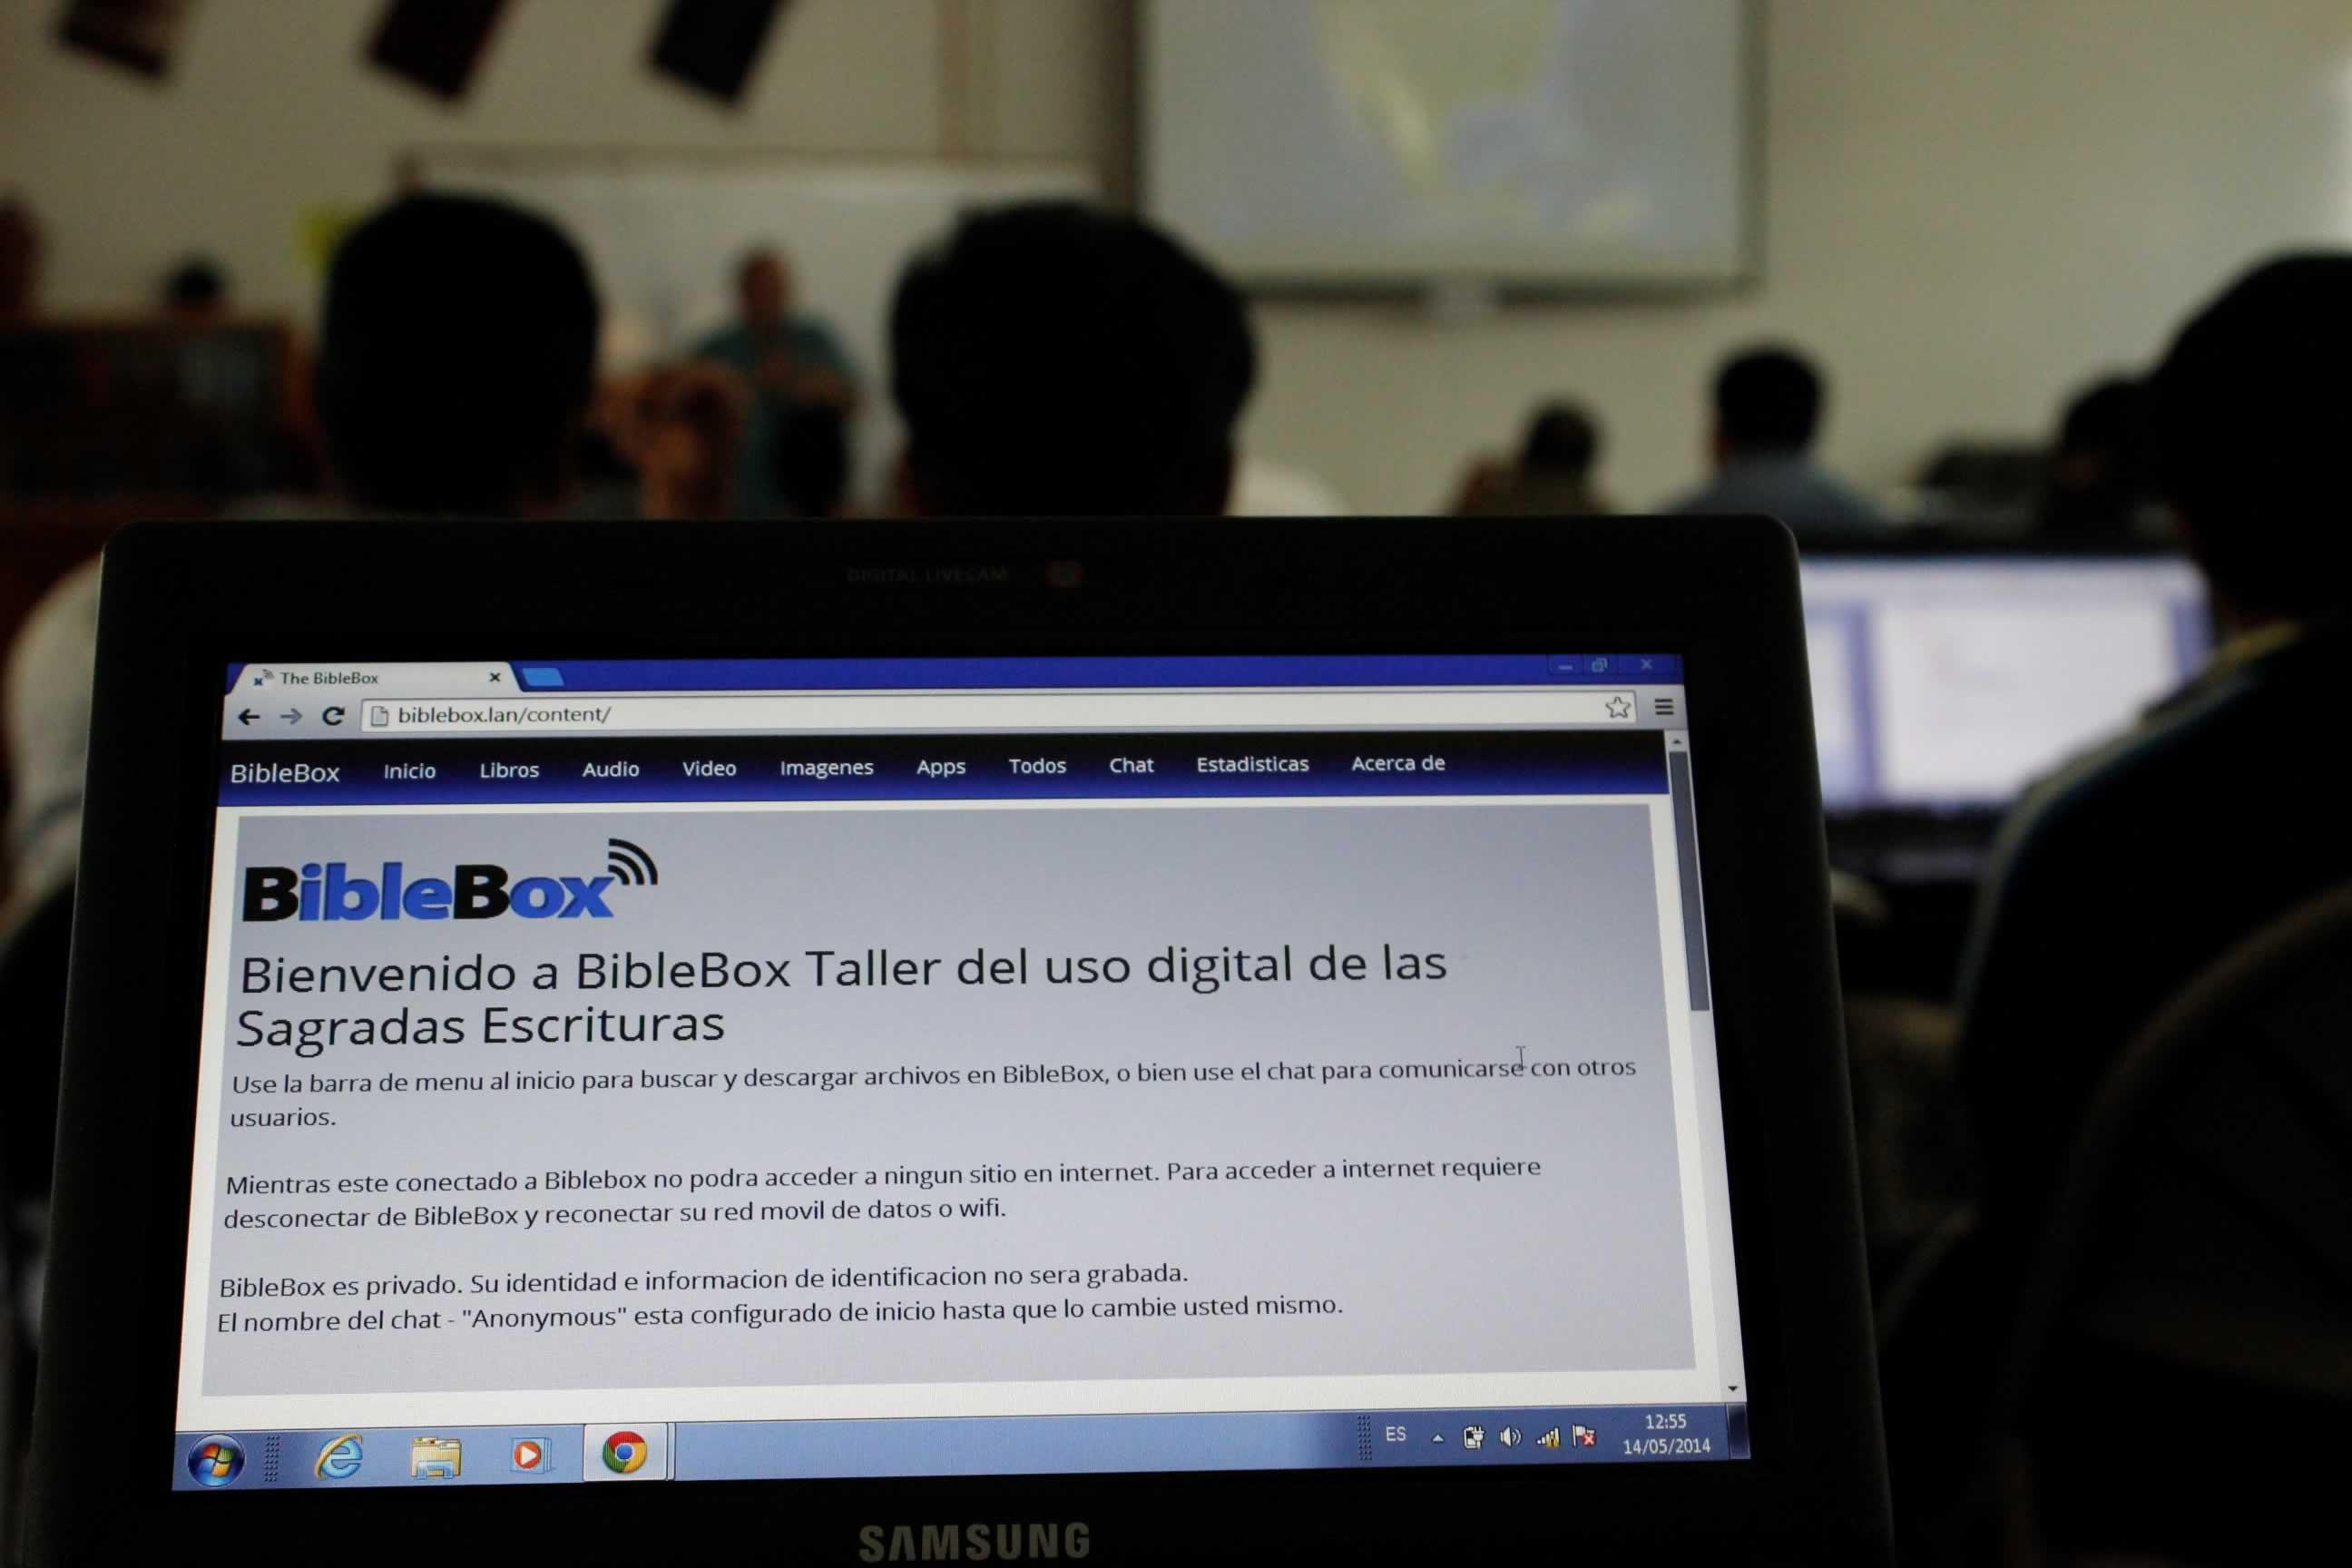 BibleBox spanish Mexico